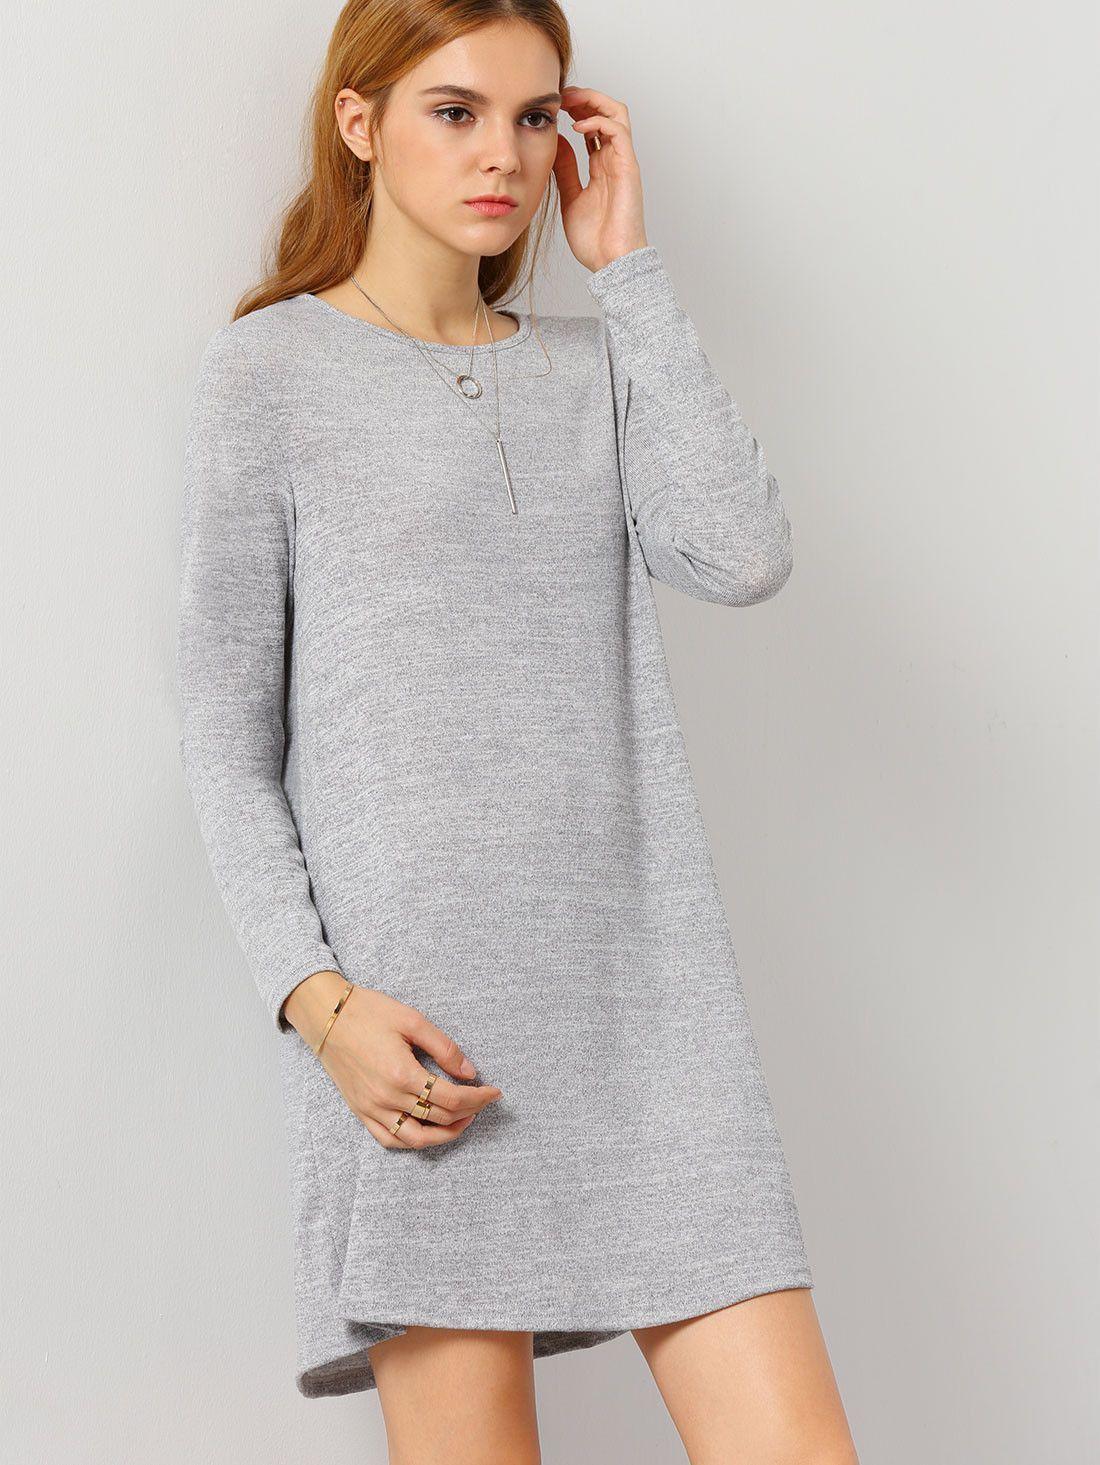 Grey long sleeve casual dress my style pinterest gray gray